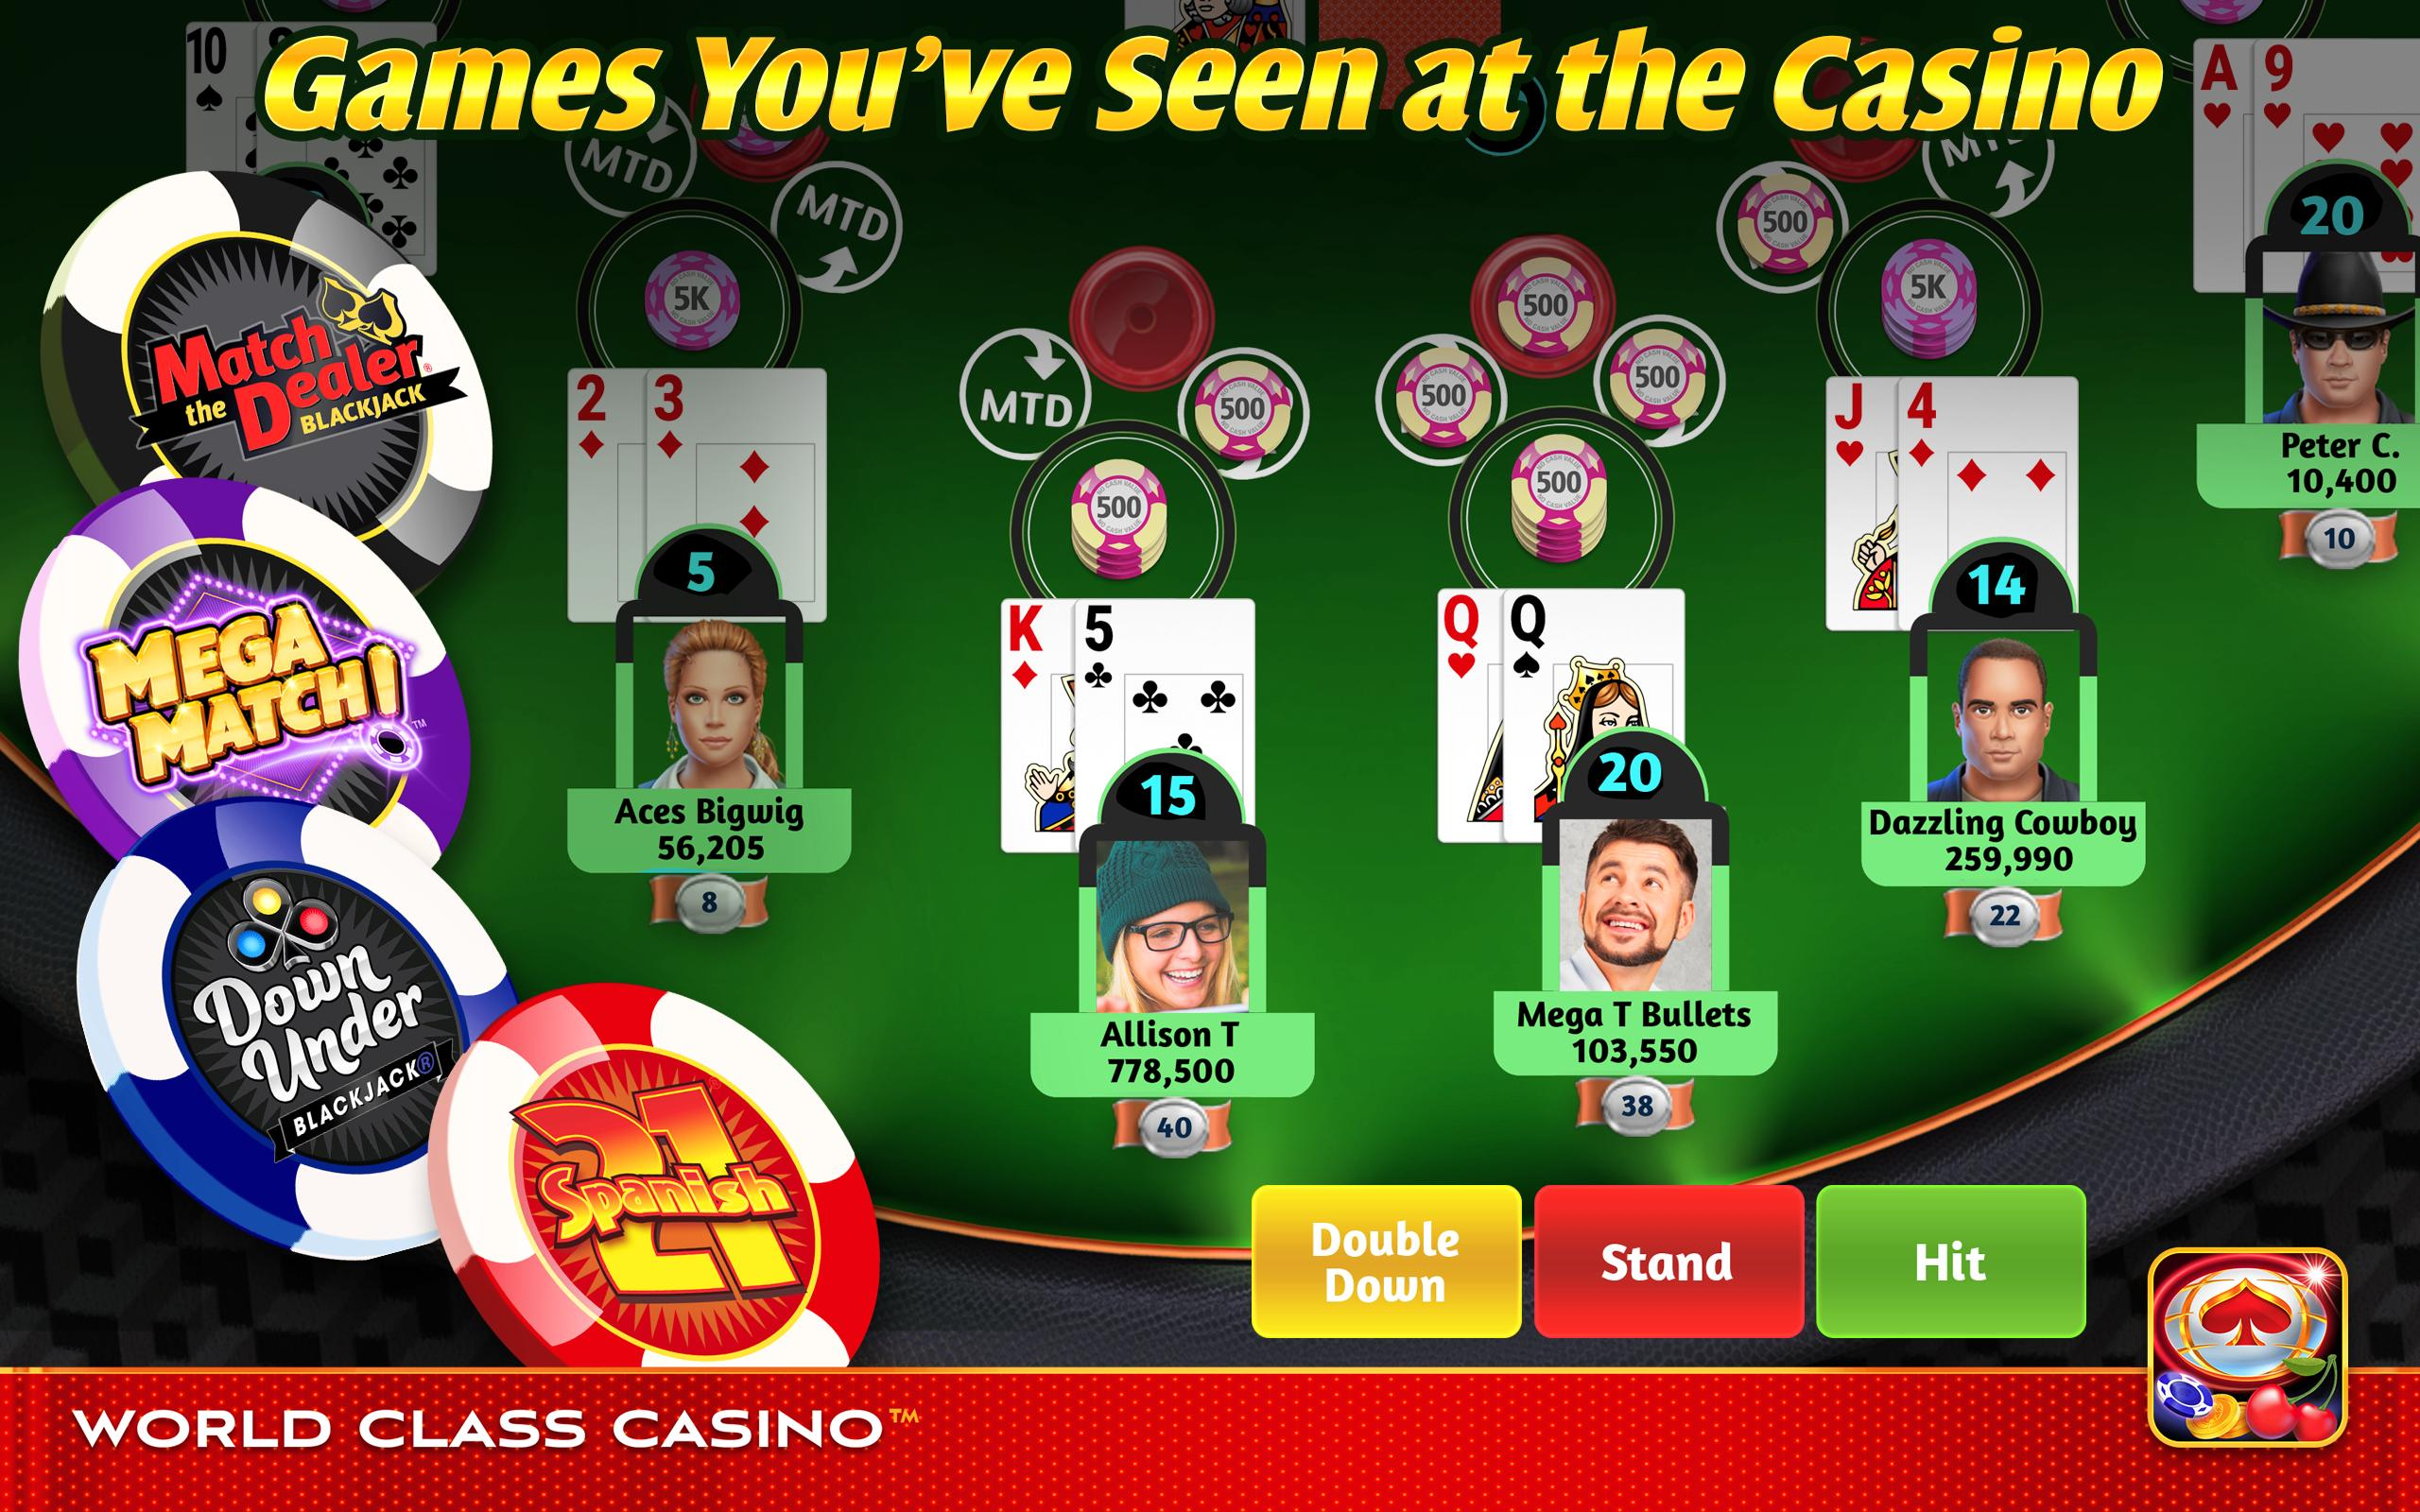 World Class Casino Slots, Blackjack & Poker Room 8.0.4 Screenshot 12